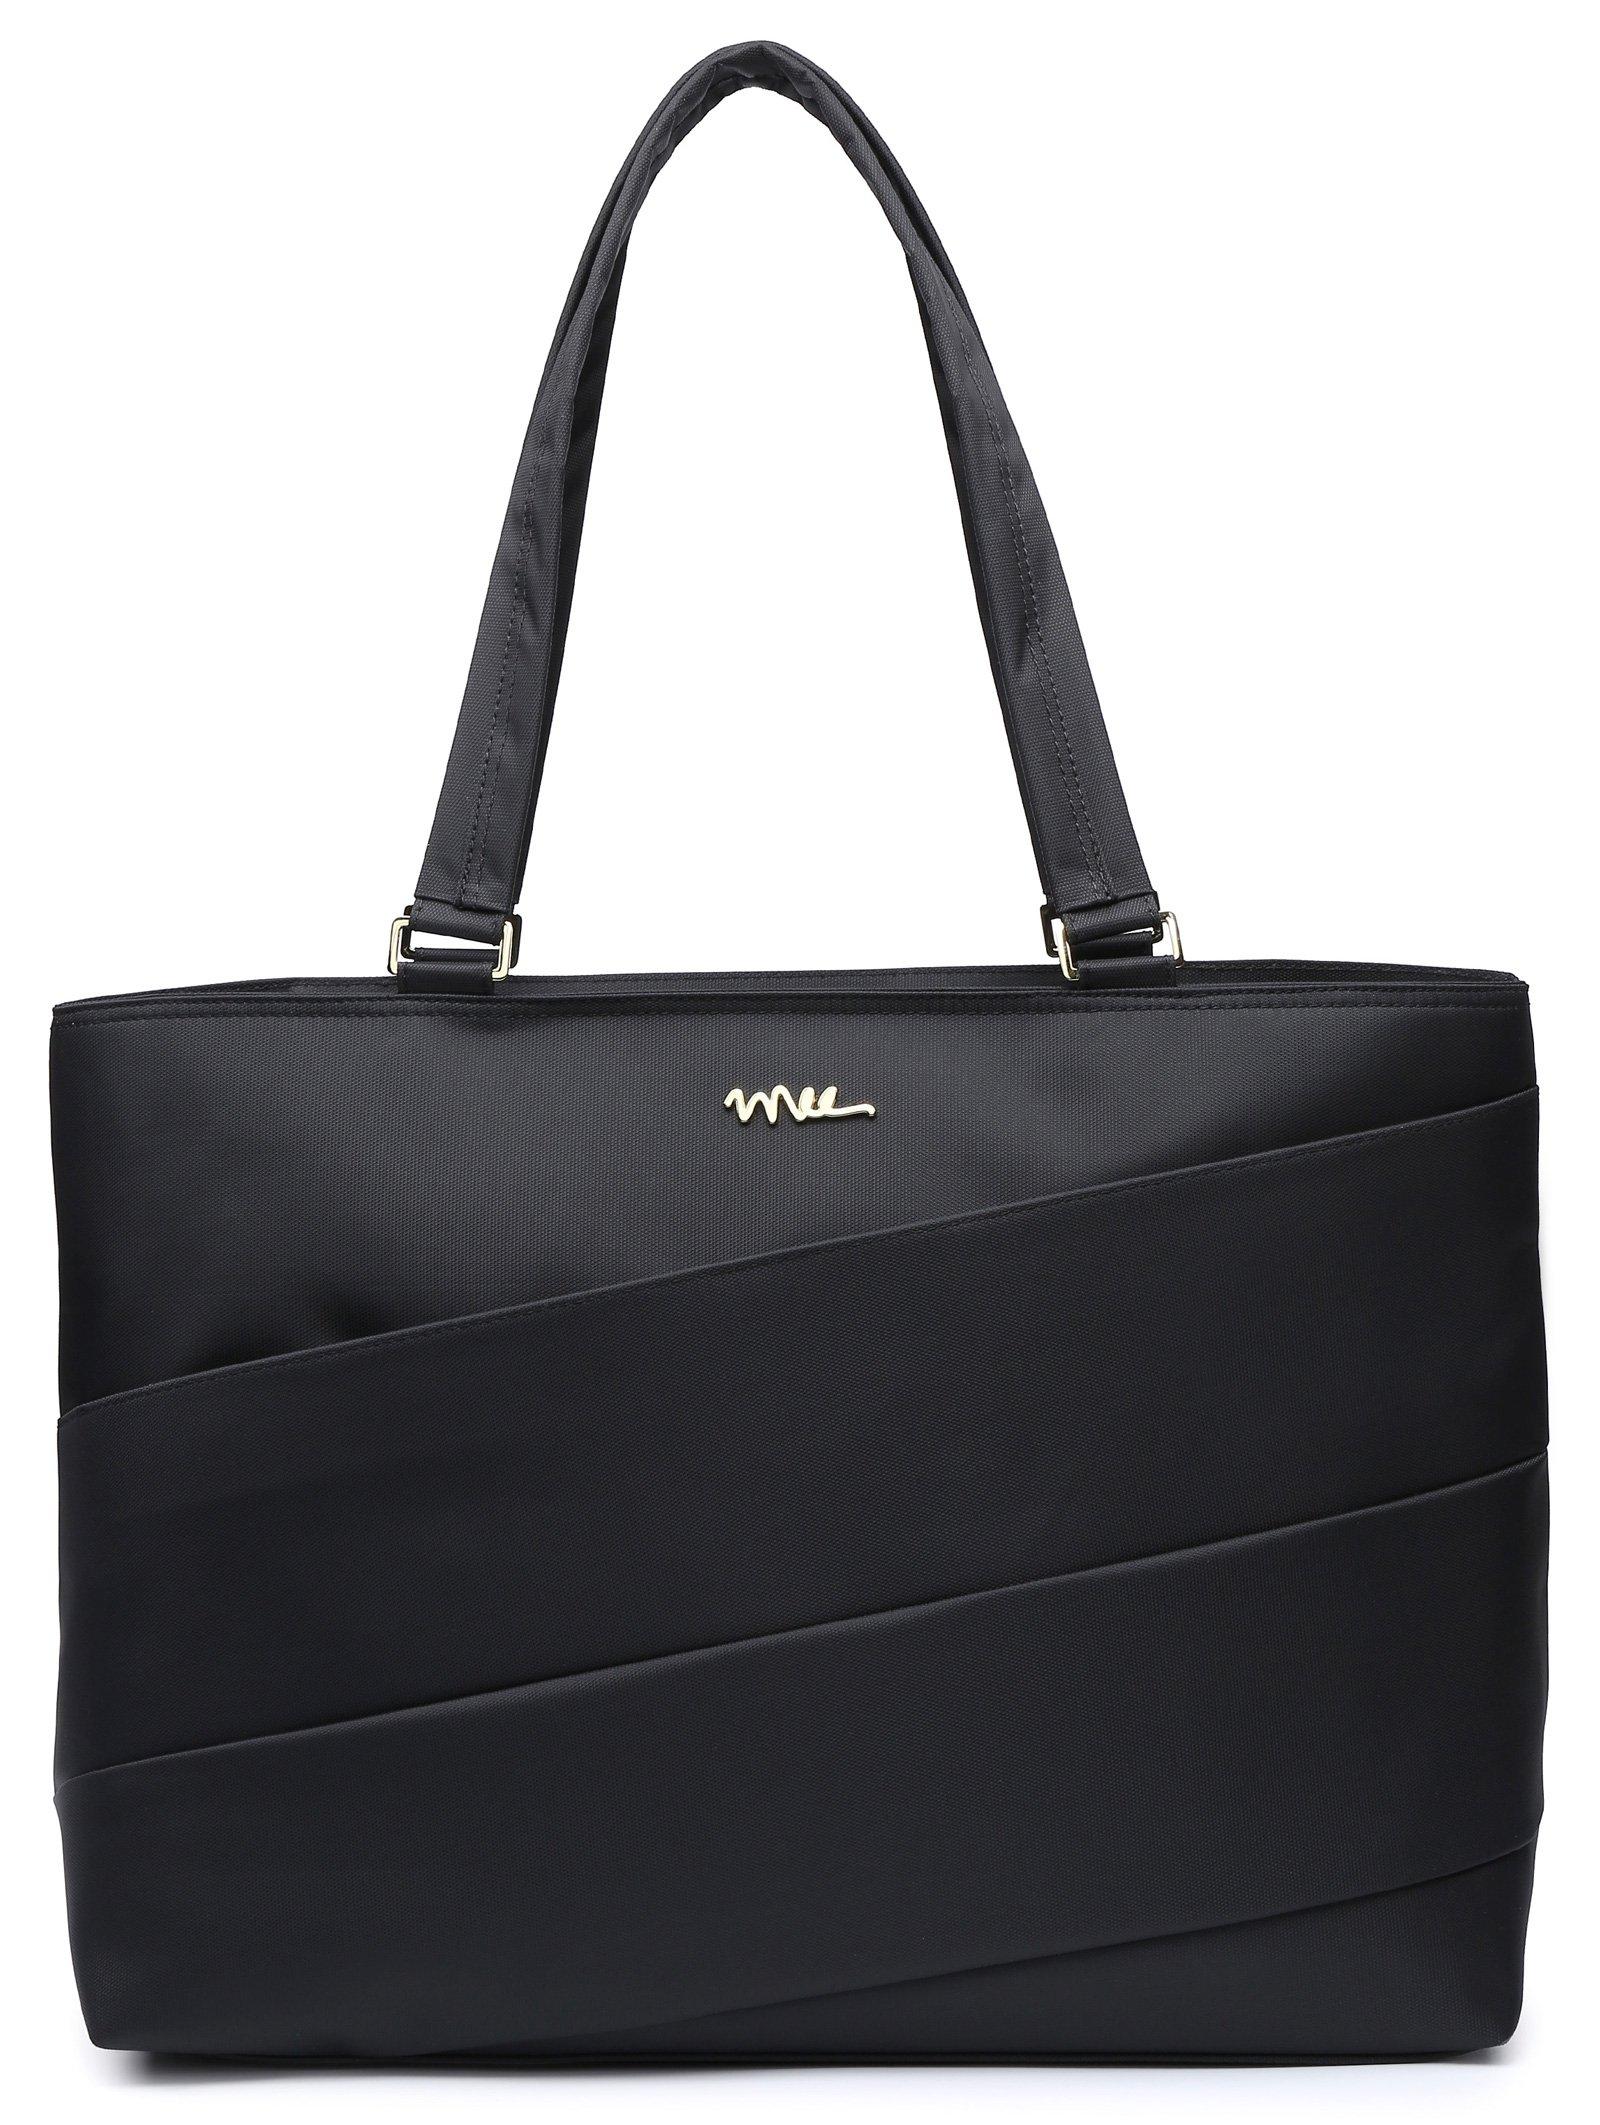 NNEE 15 15.6 Inch Water Resistance Nylon Laptop Tote Bag Notebook Computer Work Handbag Travel Carrying Bag - Black